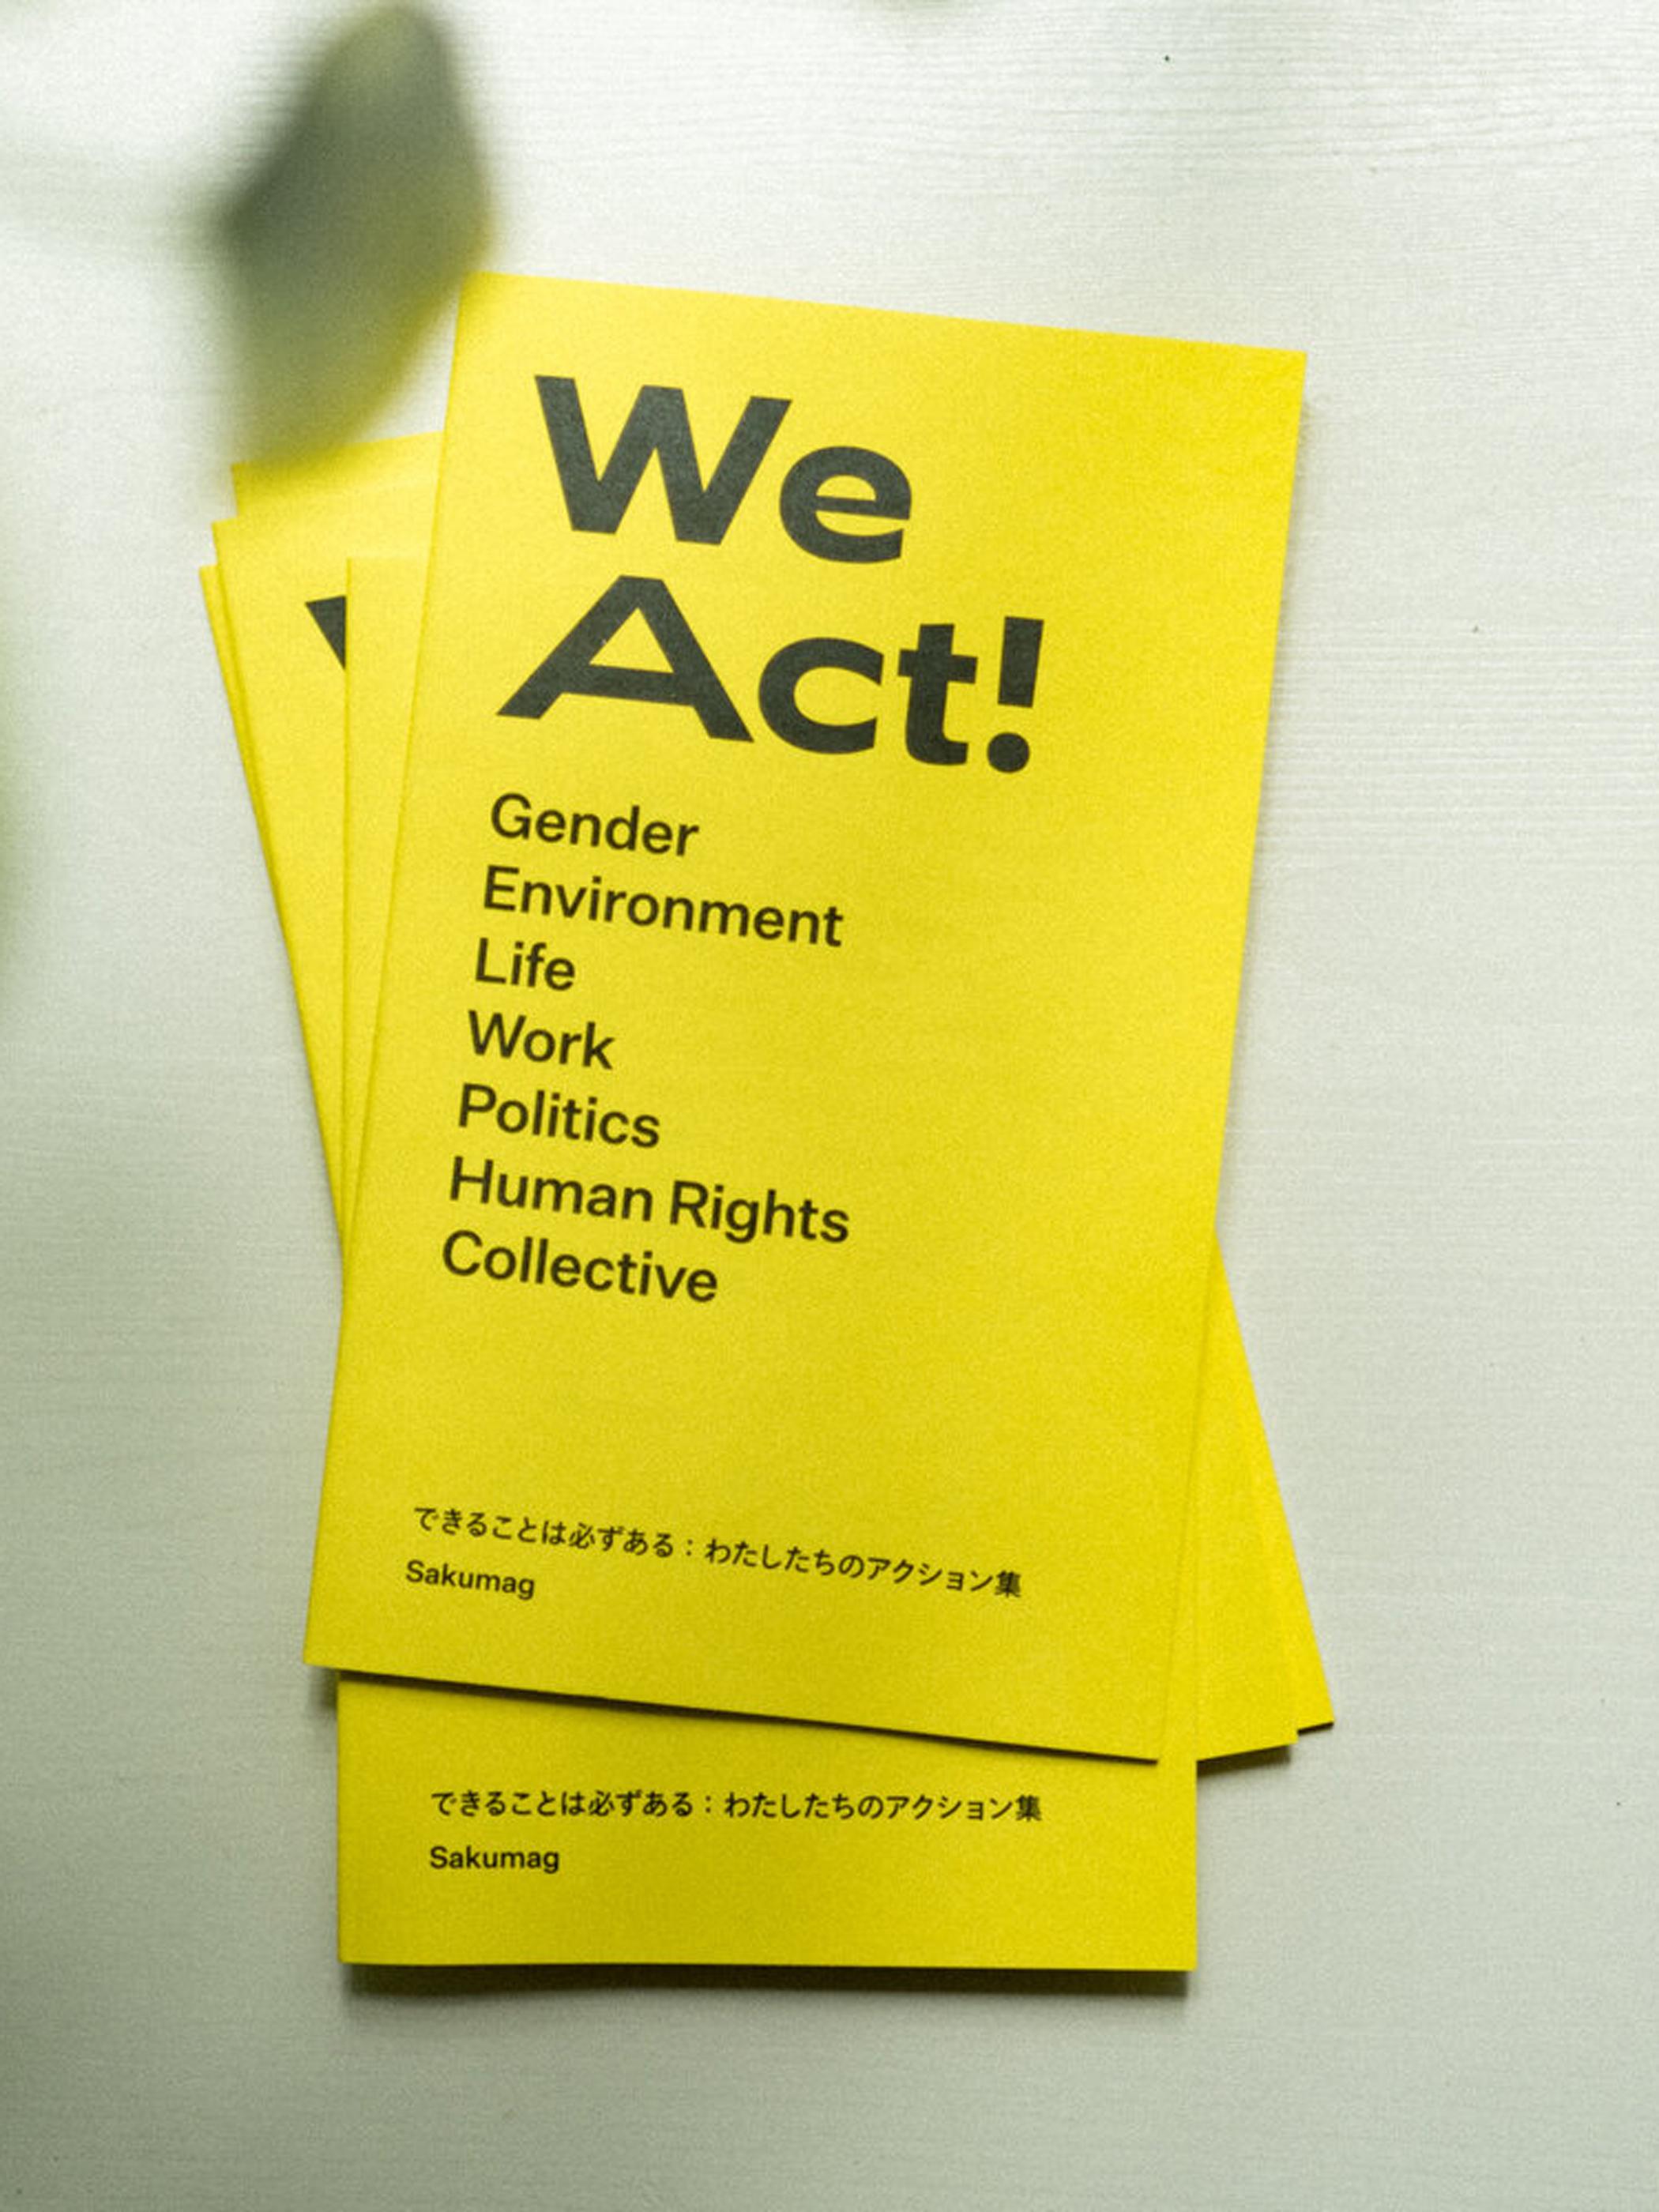 We Act! by Sakumag